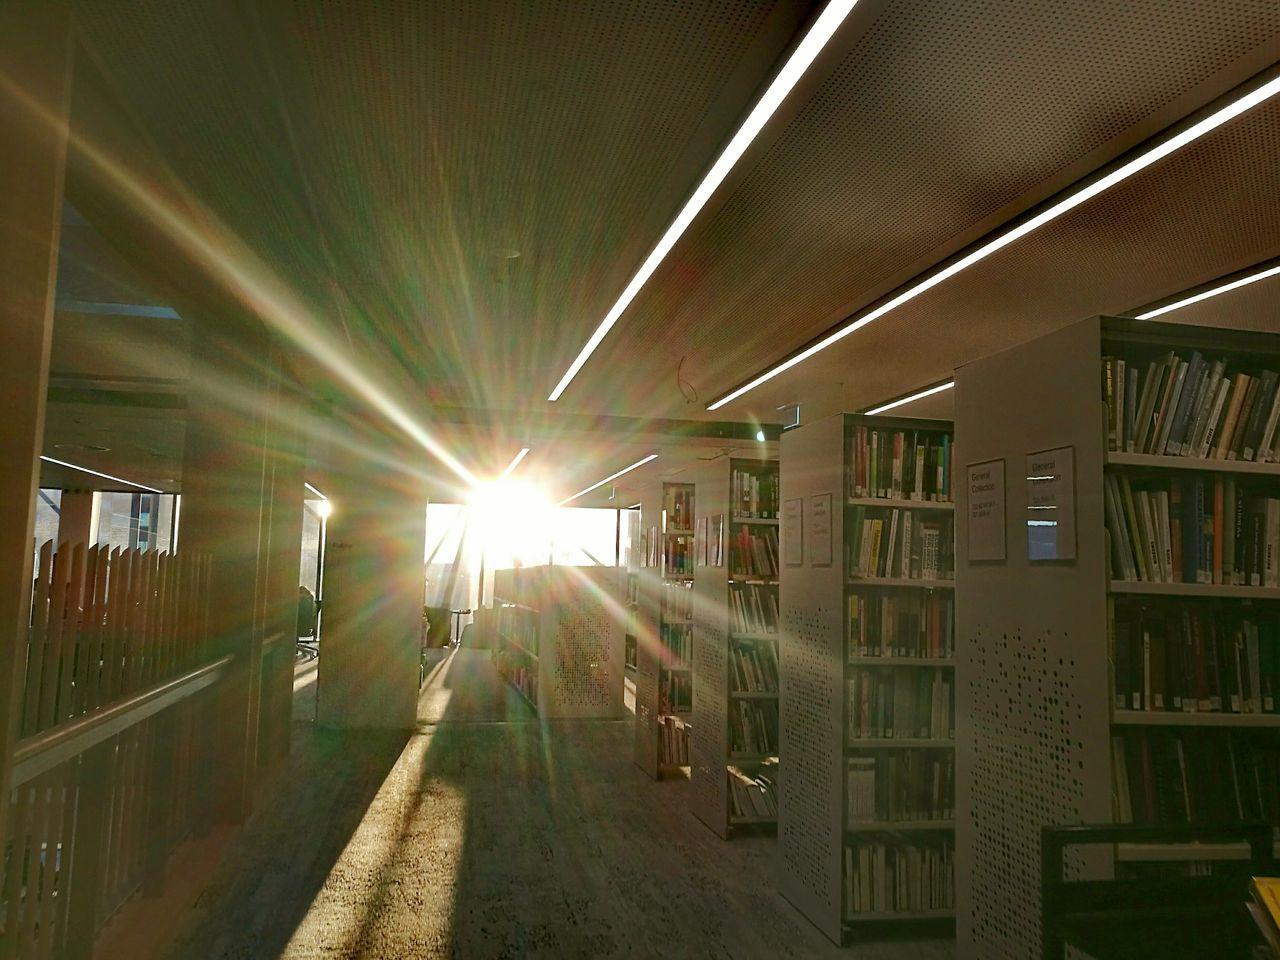 indoors, illuminated, architecture, library, bookshelf, no people, day